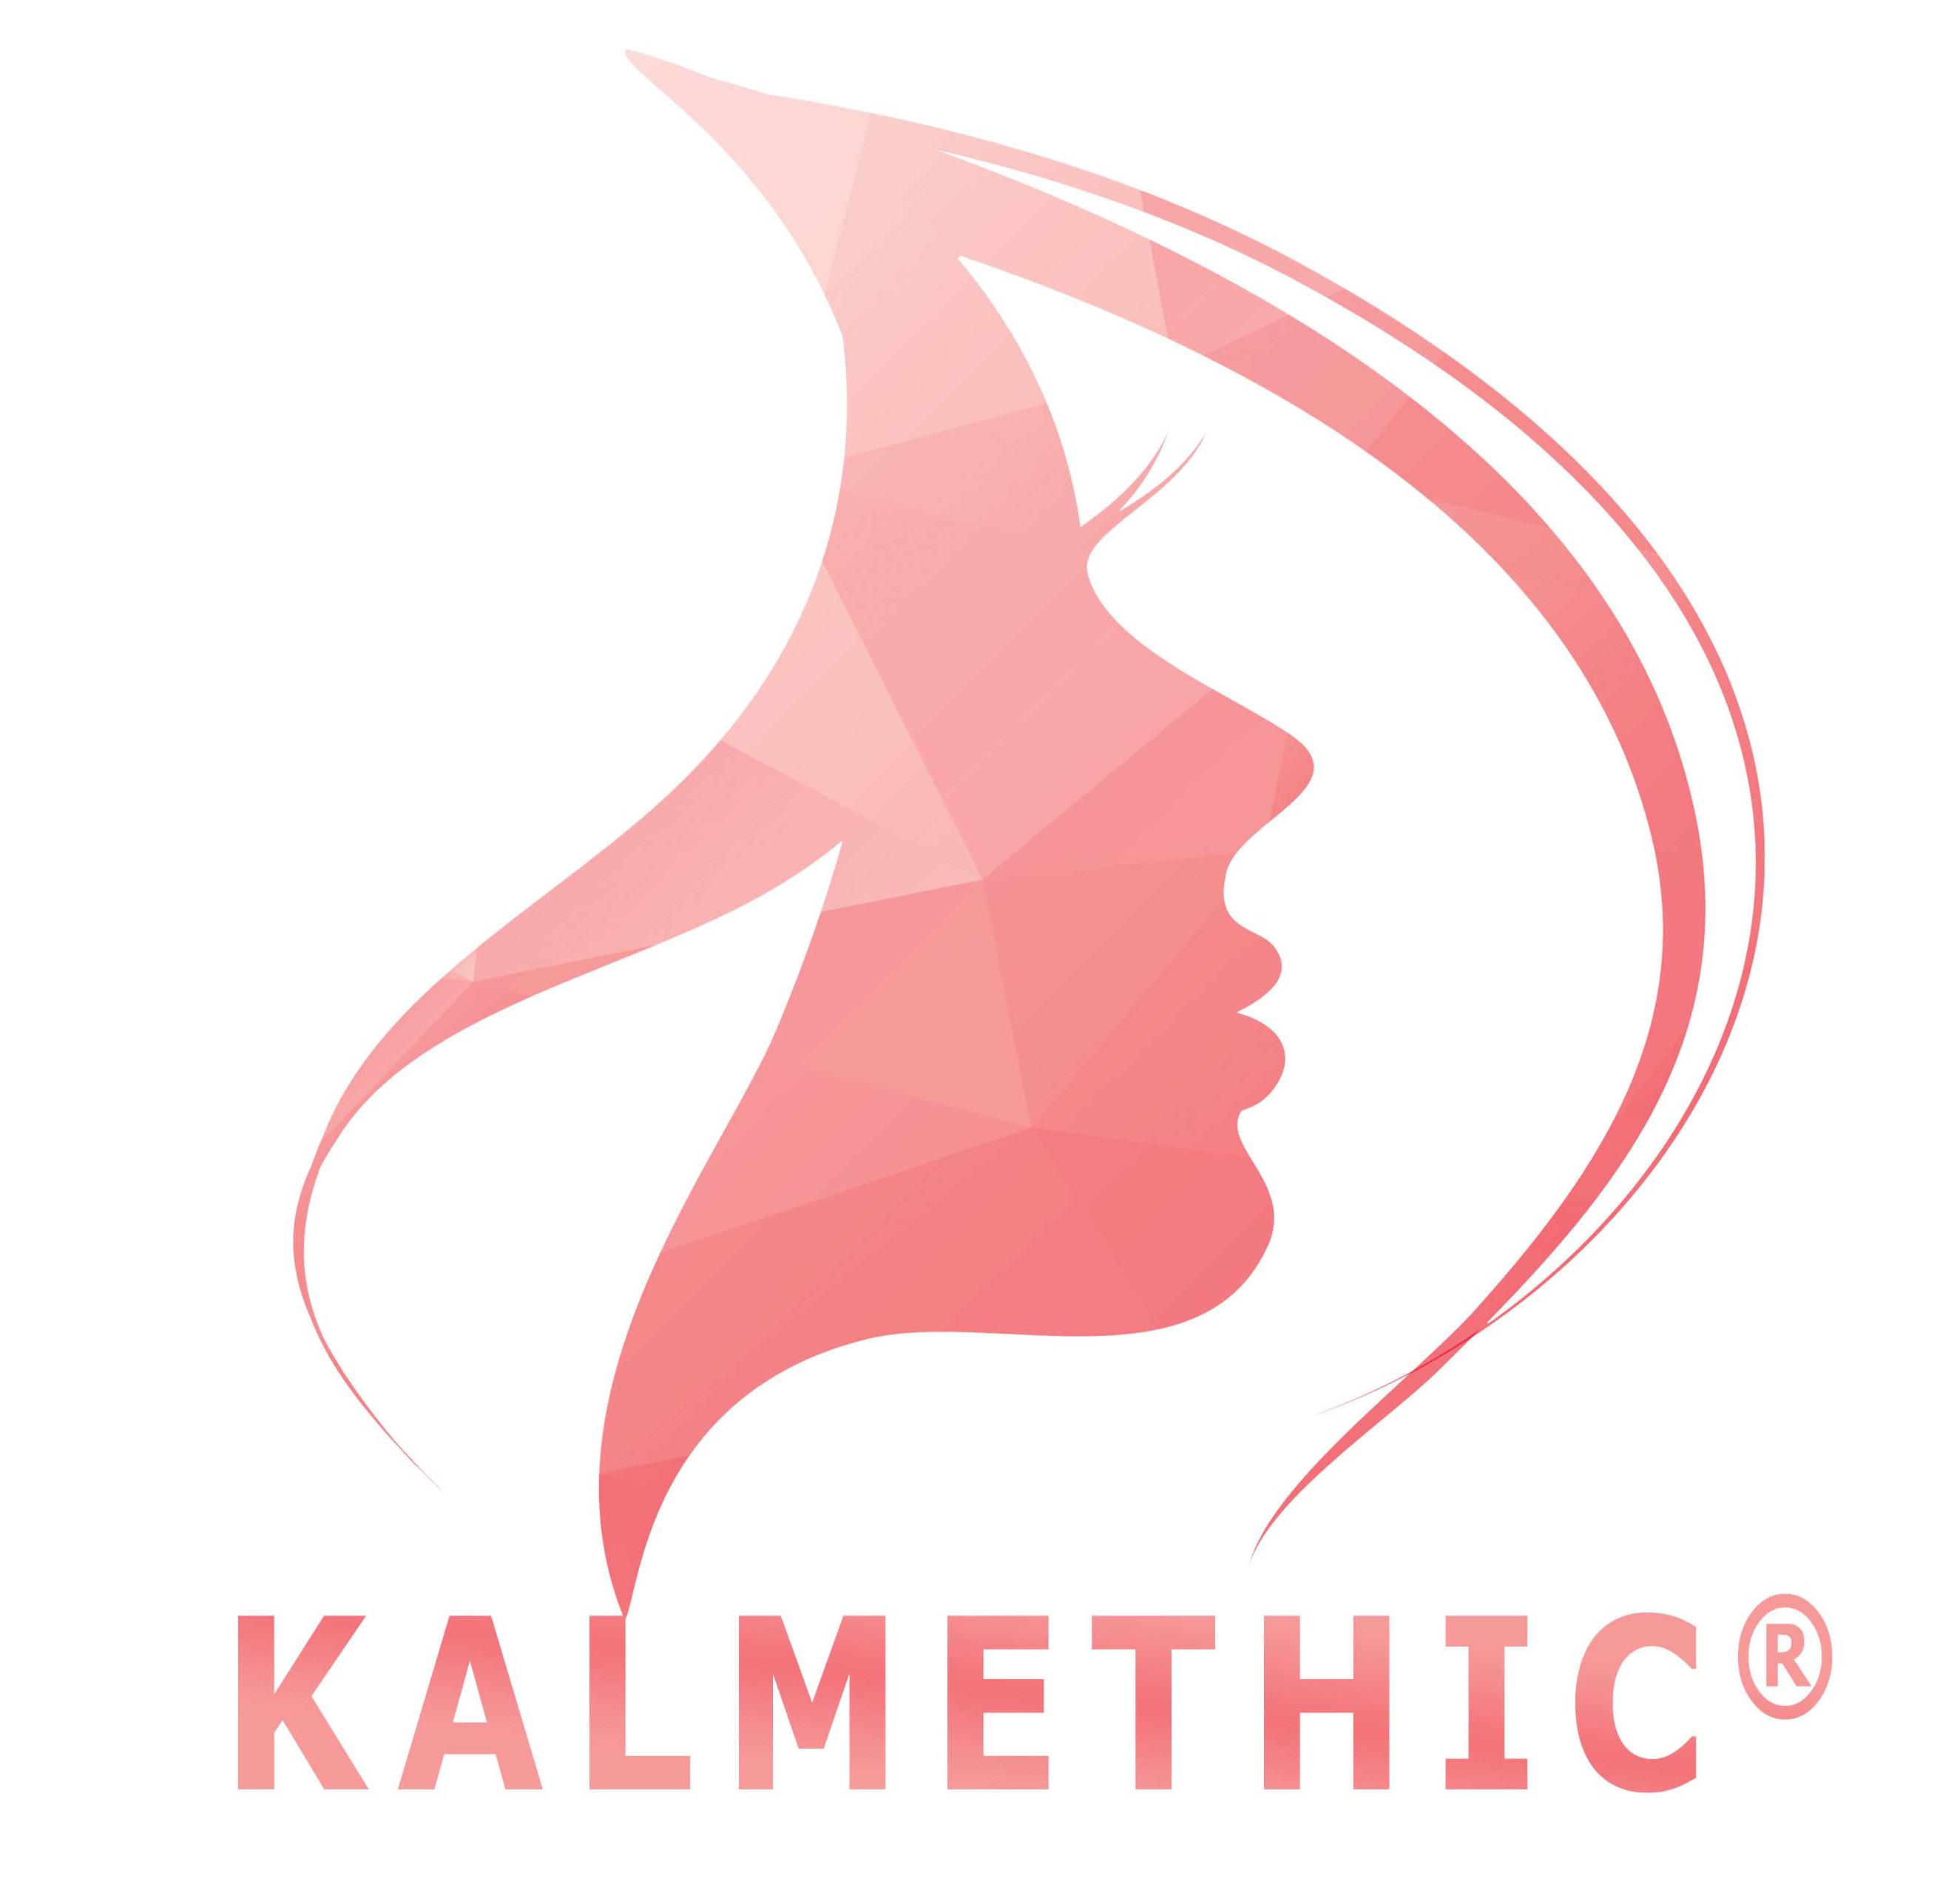 logo_kalmethic_web.jpg